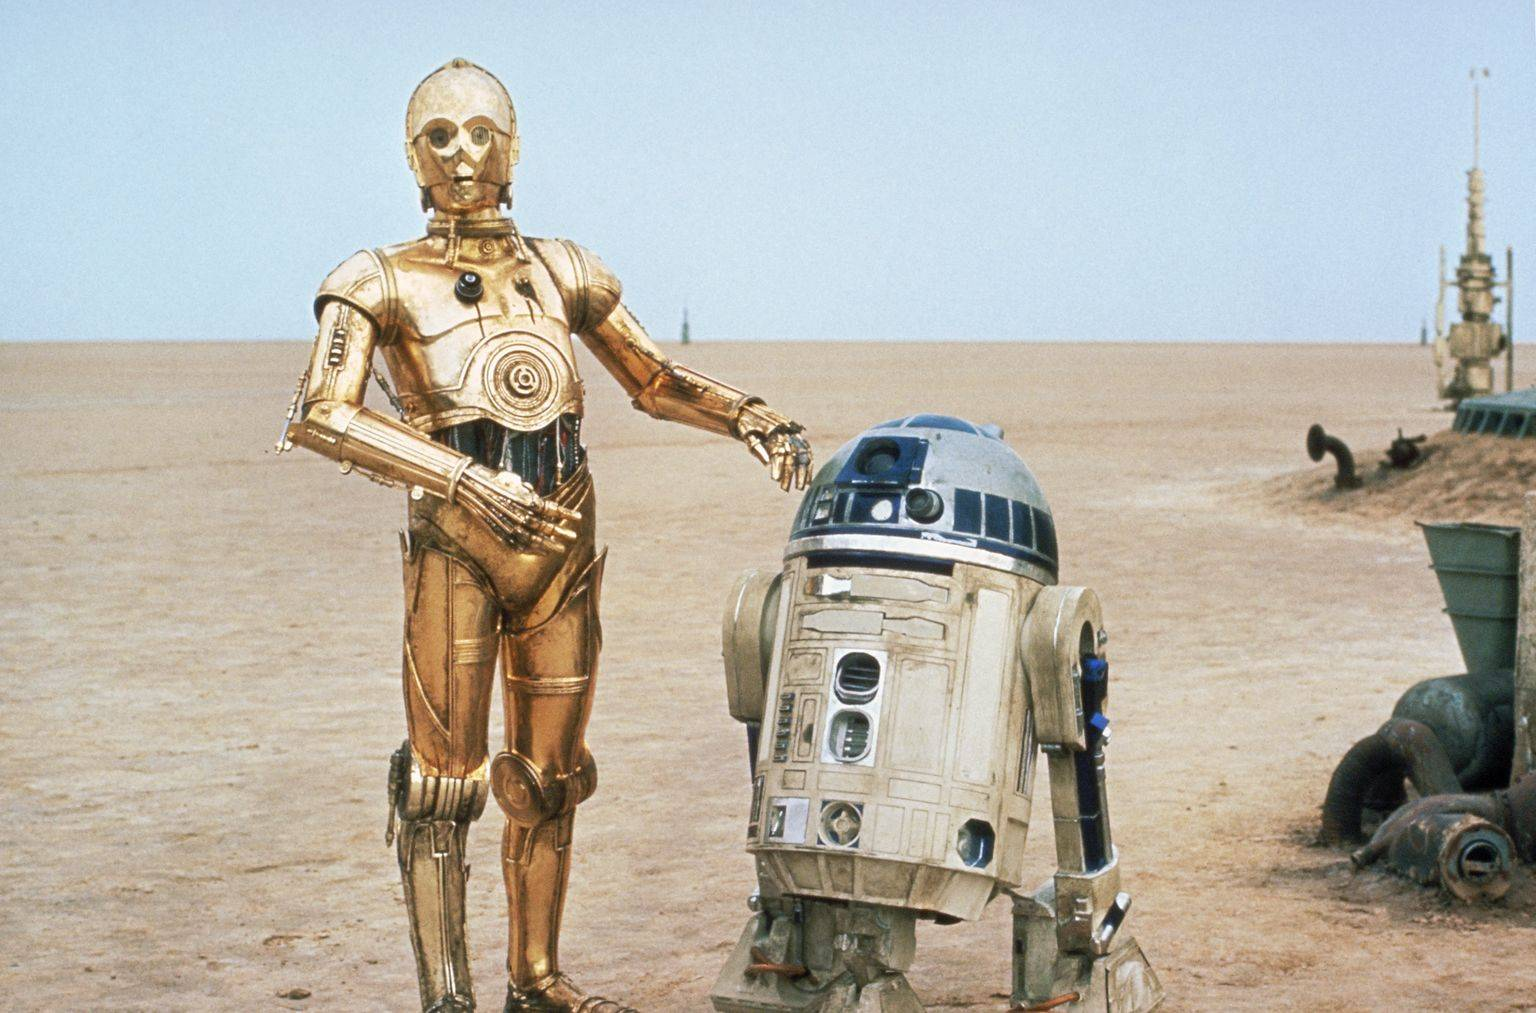 R2D2-C3PO